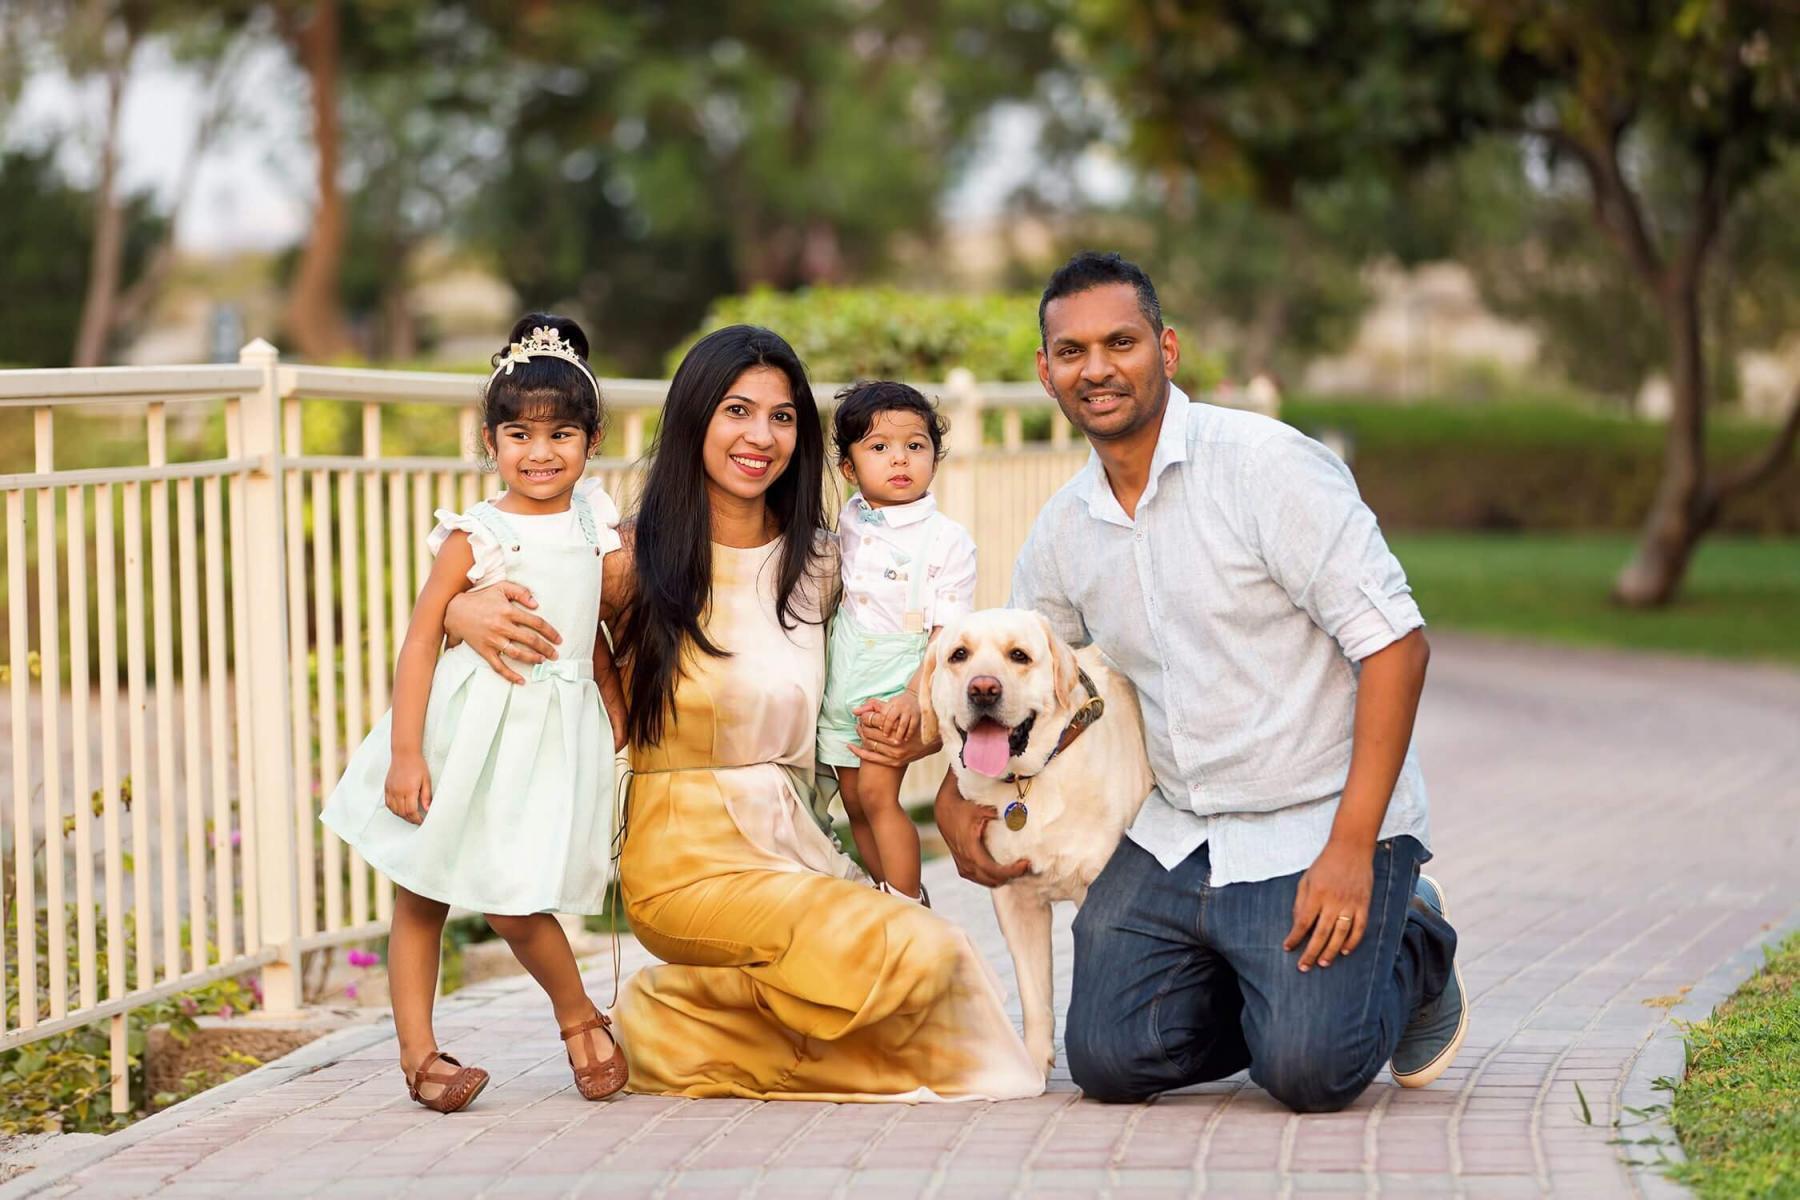 Family photoshoot in Springs community in Dubai